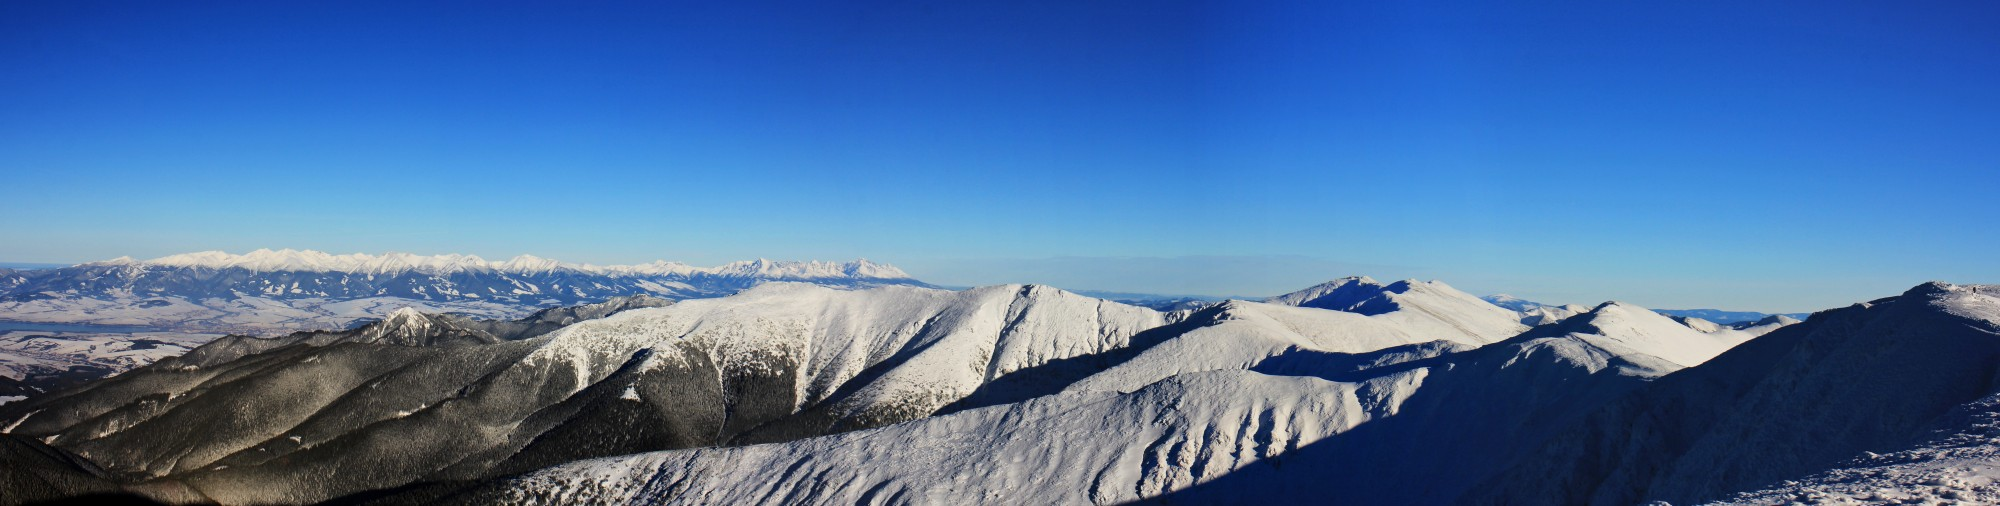 Nízke_Tatry_-_Chabenec_30.12.2016__(171)_panorama.jpg